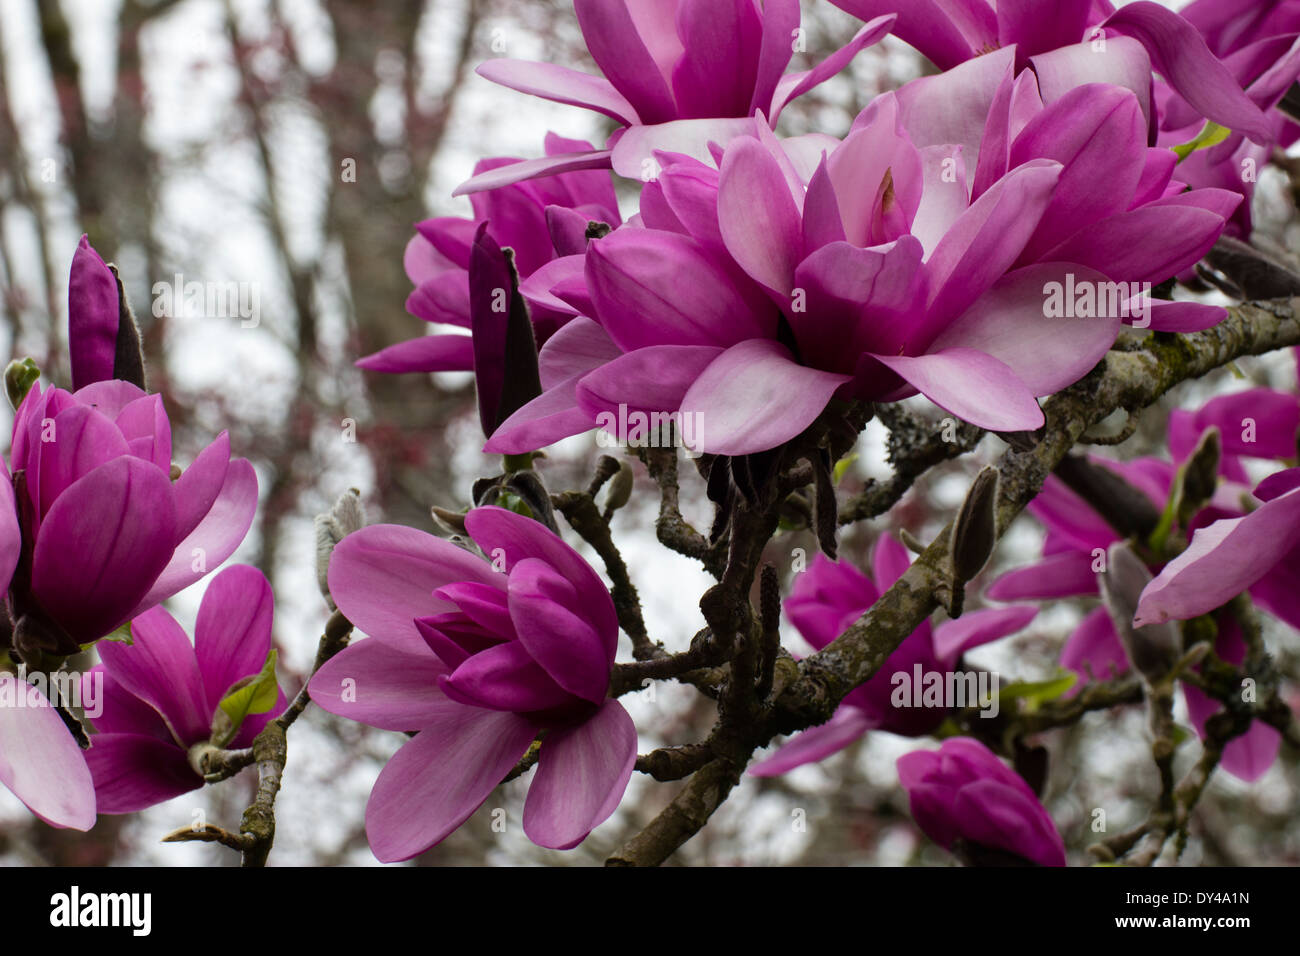 Flowers of the tree Magnolia 'Apollo' in a Cornish garden - Stock Image